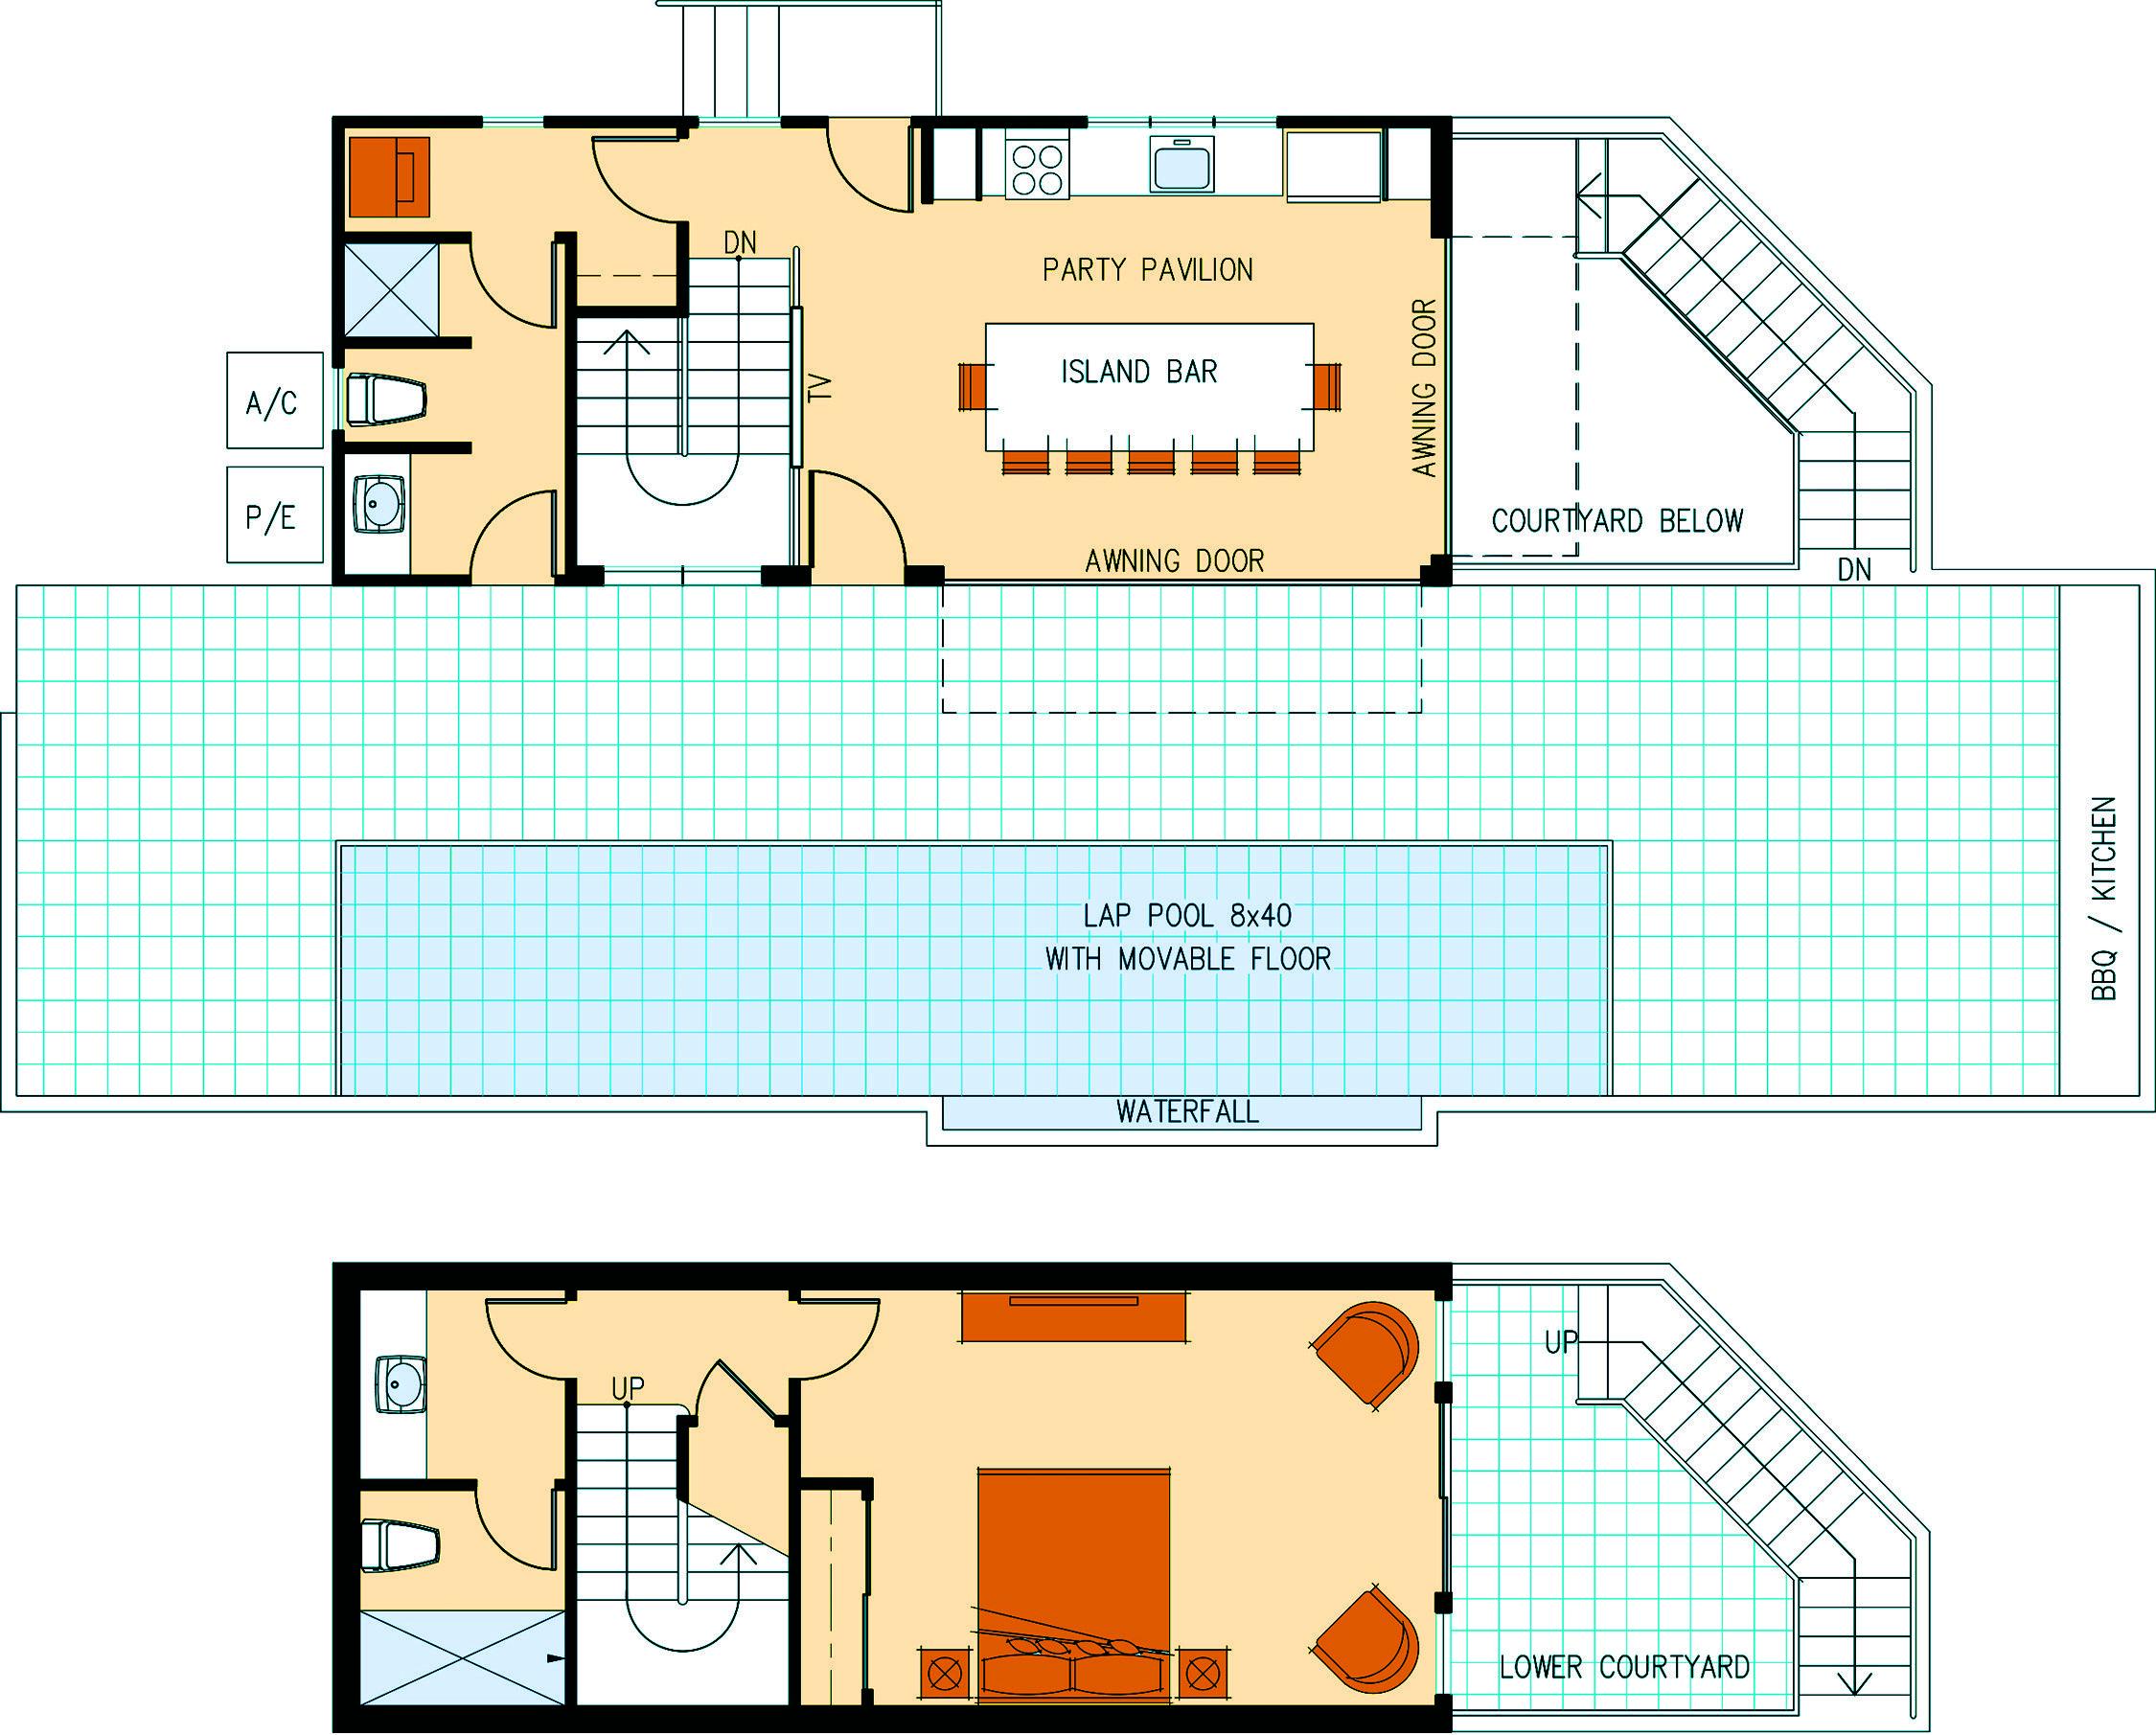 Https Www Probuilder Com Sites Probuilder Files Imce Uploads Edi 20 20pool 20house 20floor 20plan Jpg Guest House Plans House Floor Plans Pool Houses